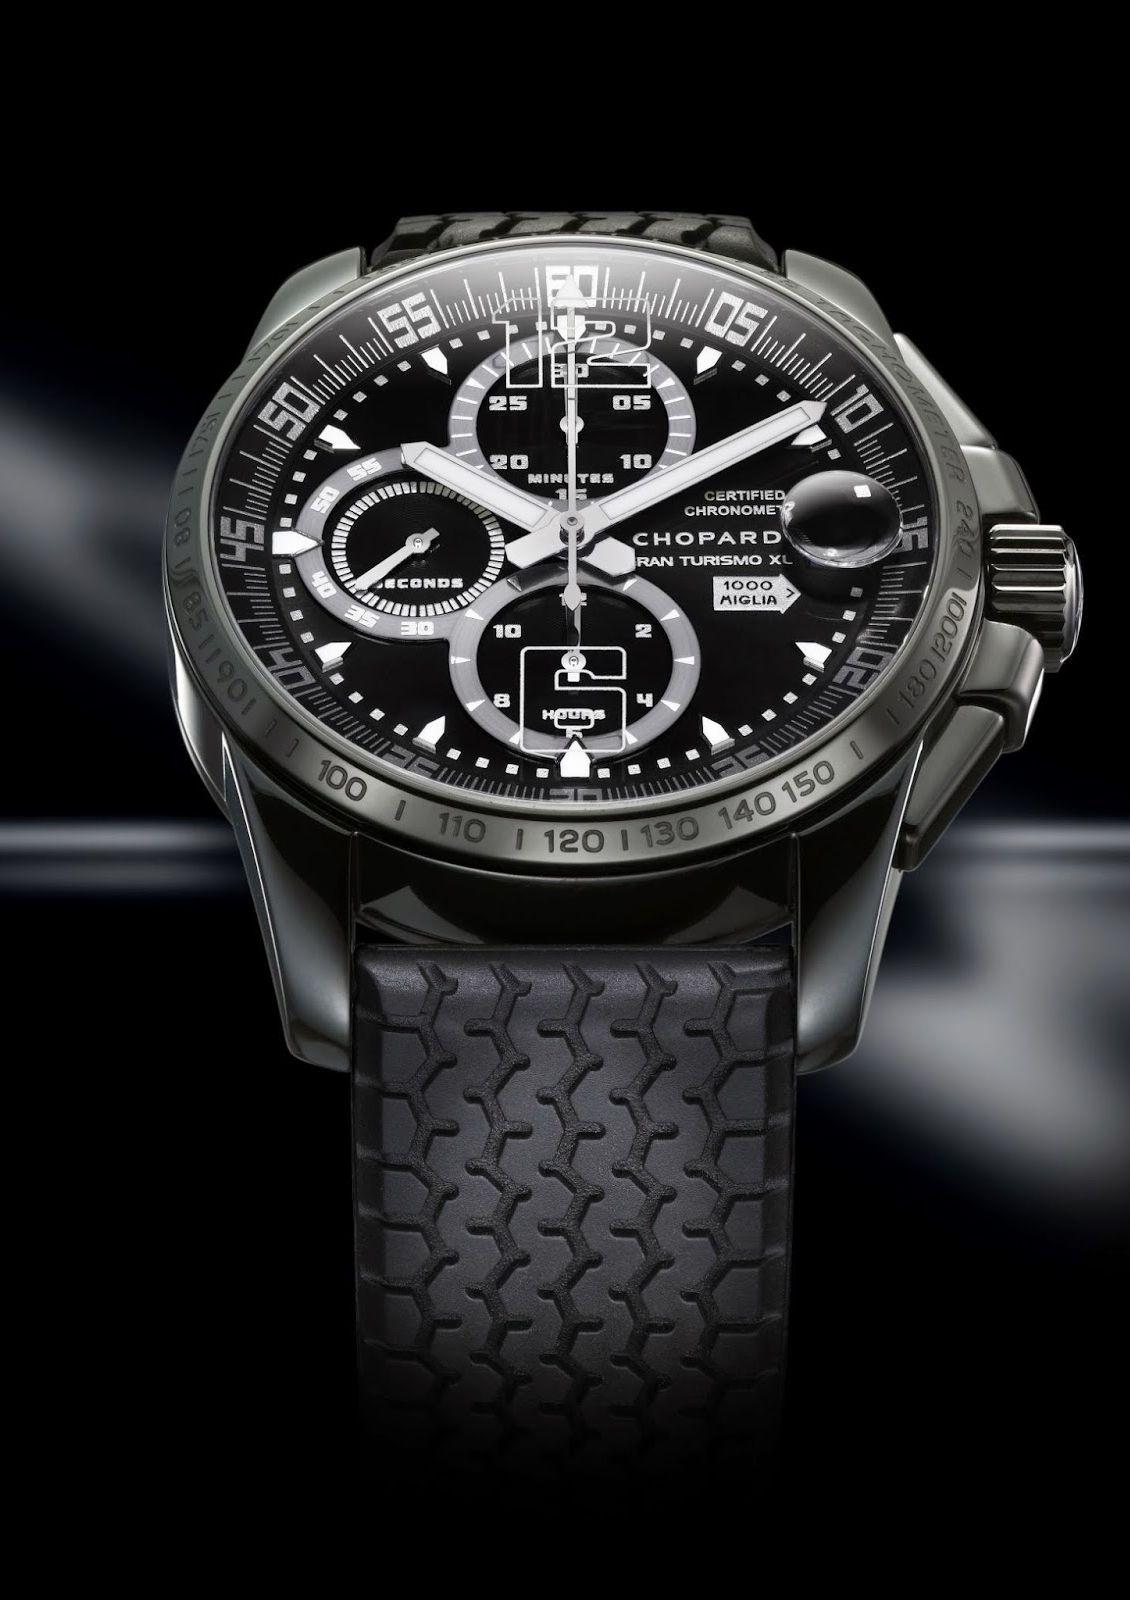 a26a551de29 Chopard Mille Miglia GT XL Chrono Speed Black chronometer wrist watch  (front view)